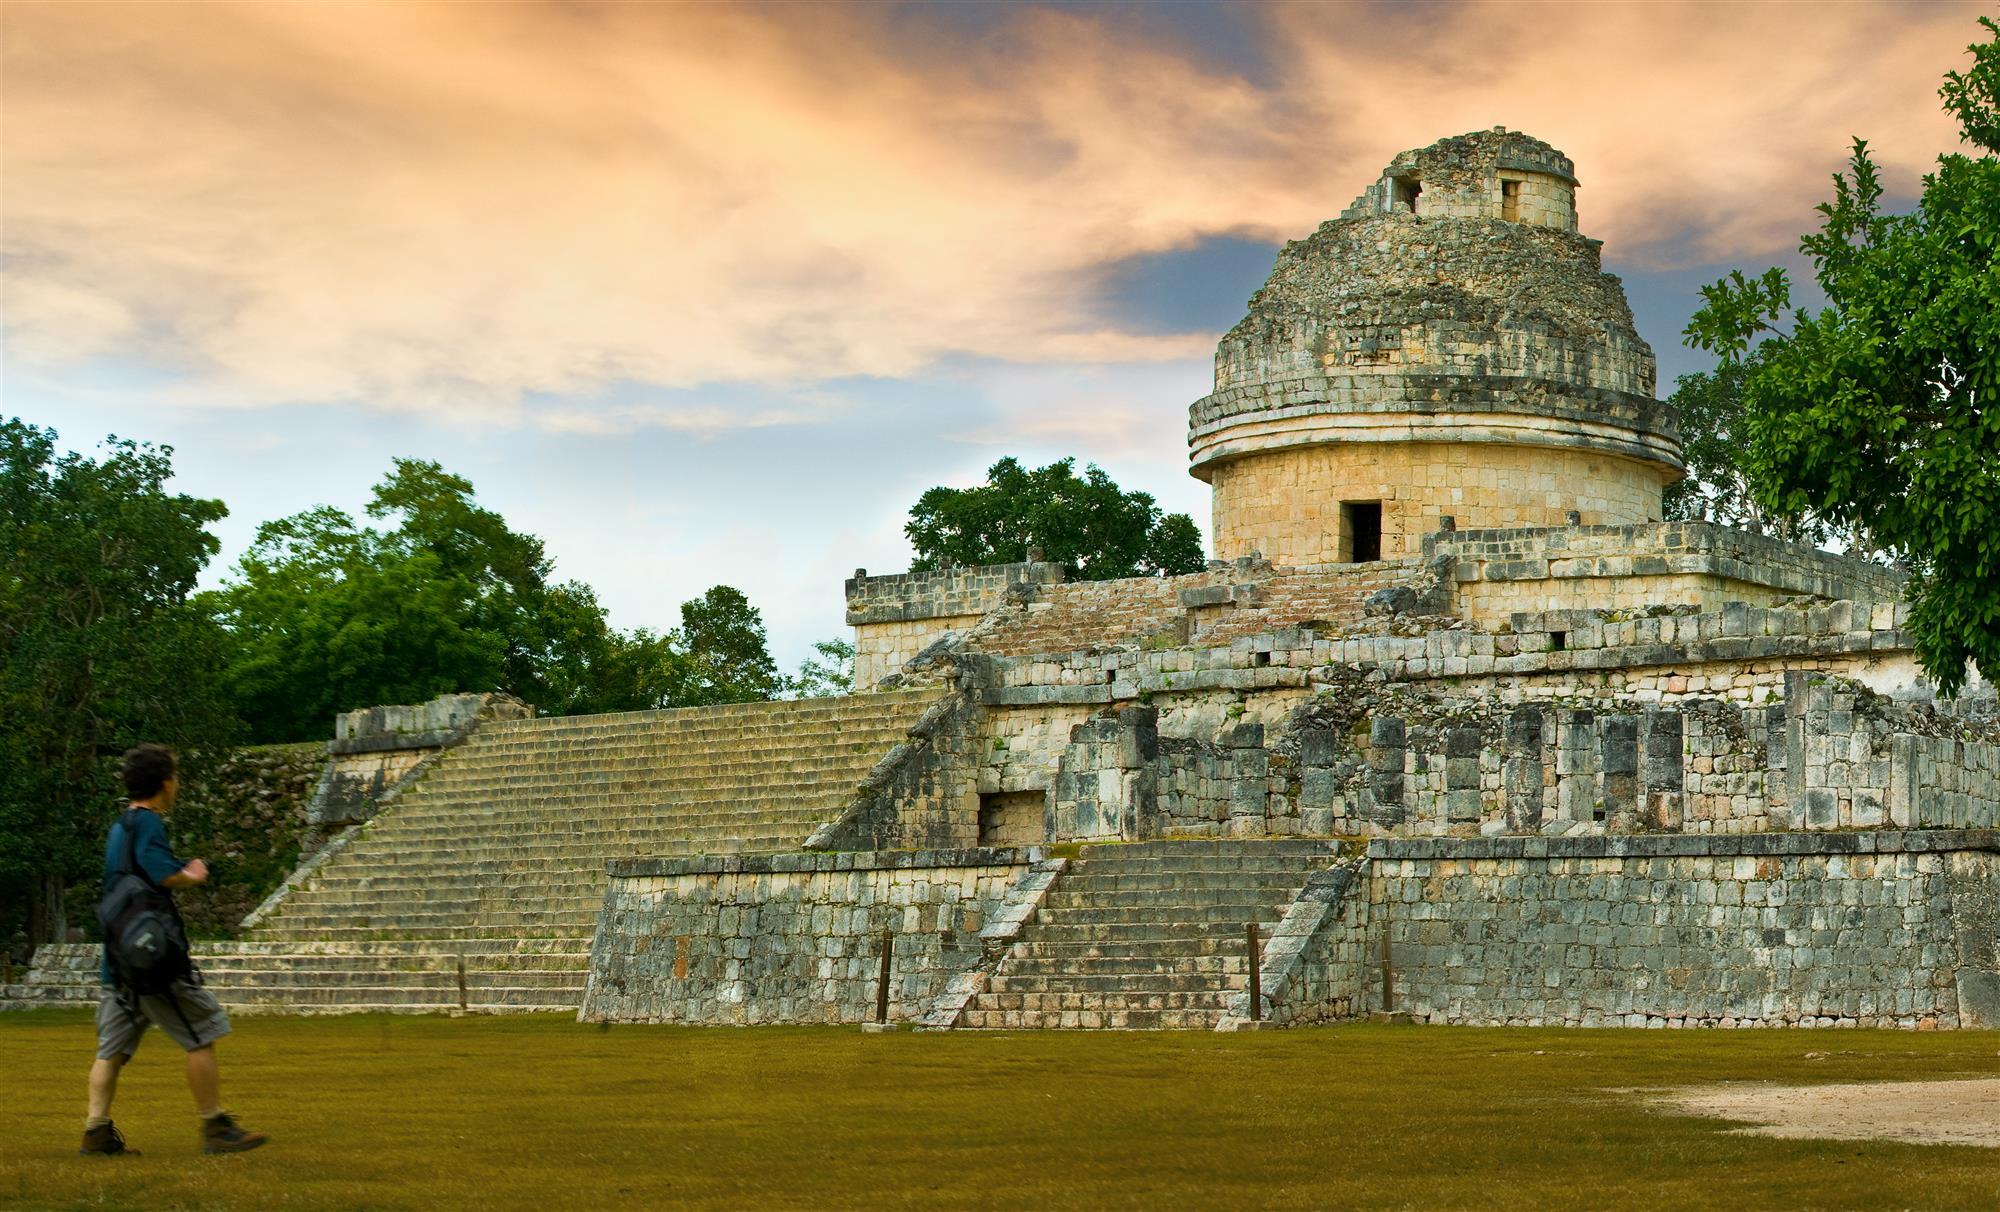 observatorio. Observatorio de Chichén Itzá